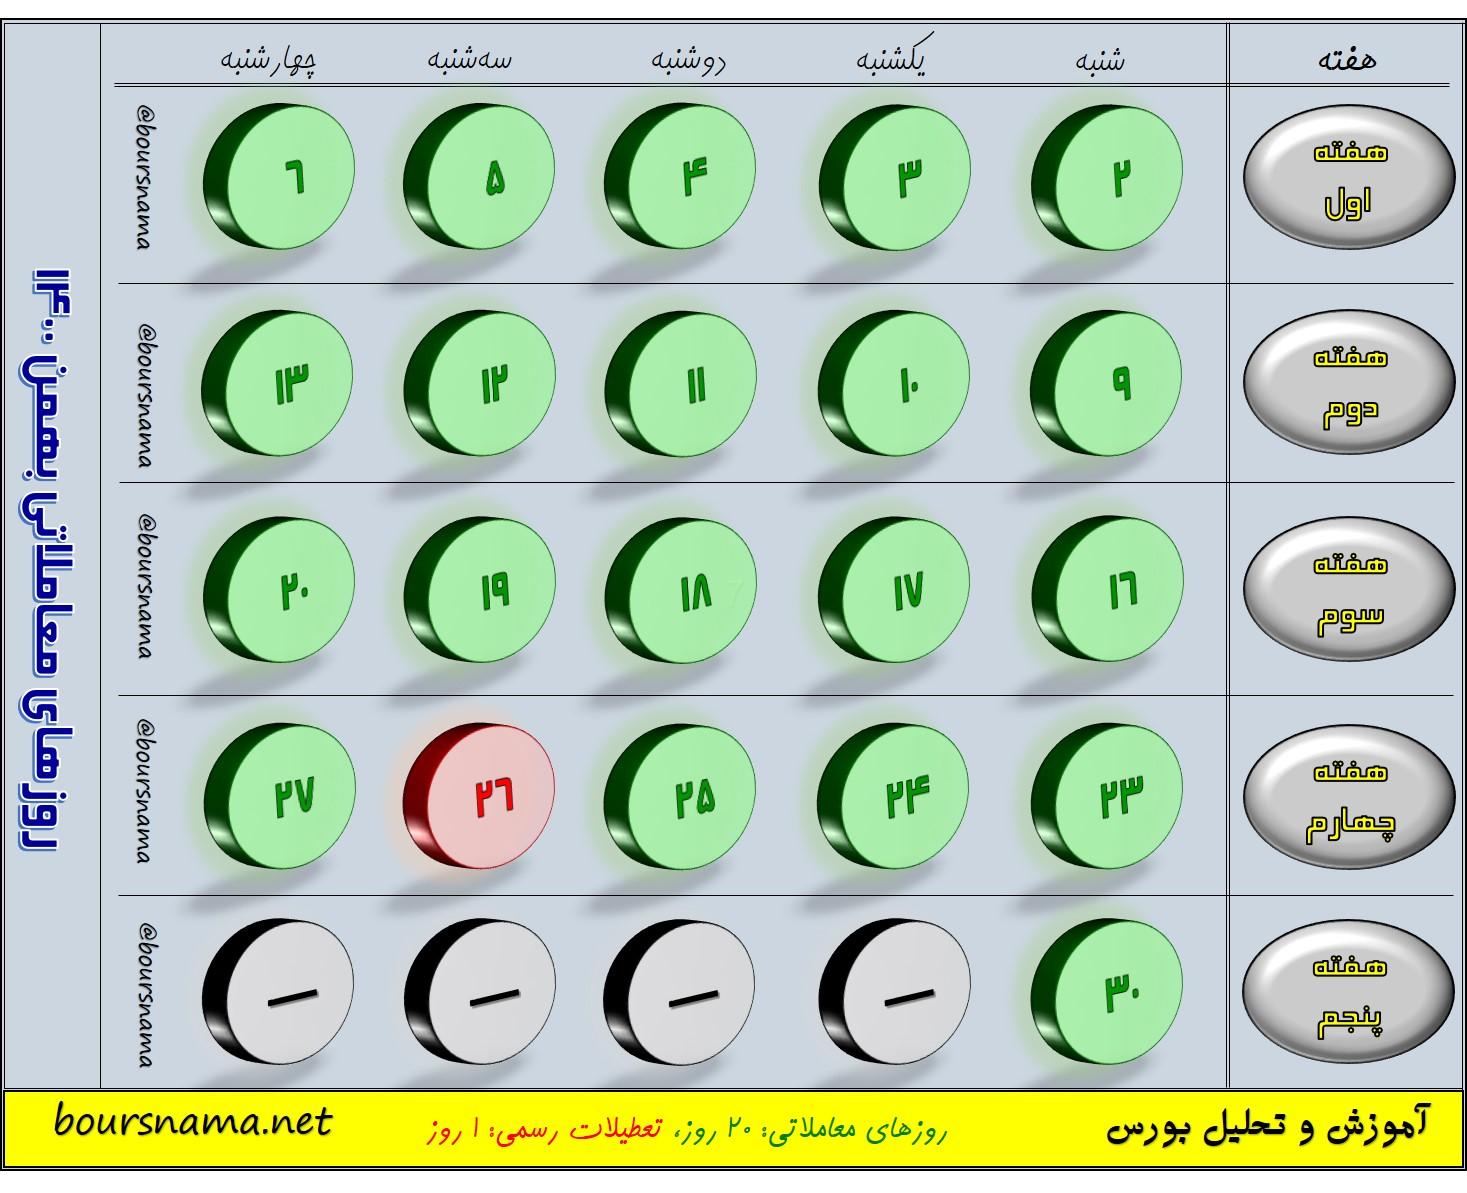 تقویم معاملاتی بورس بهمن